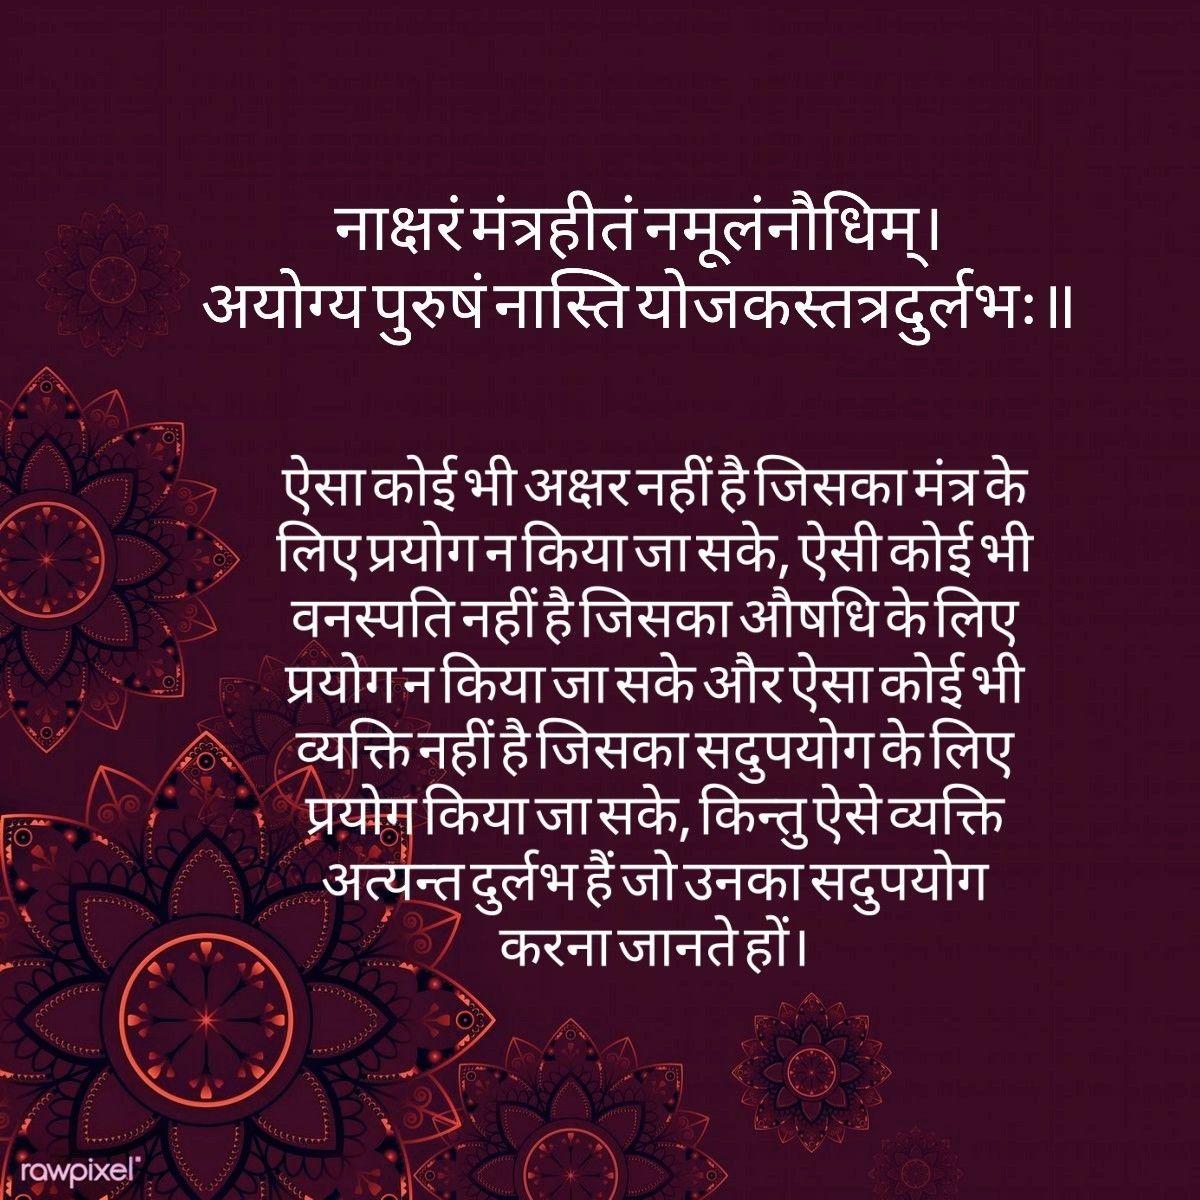 Sanskrit Quote Hindi In 2020 Sanskrit Mantra Mantras Sanskrit